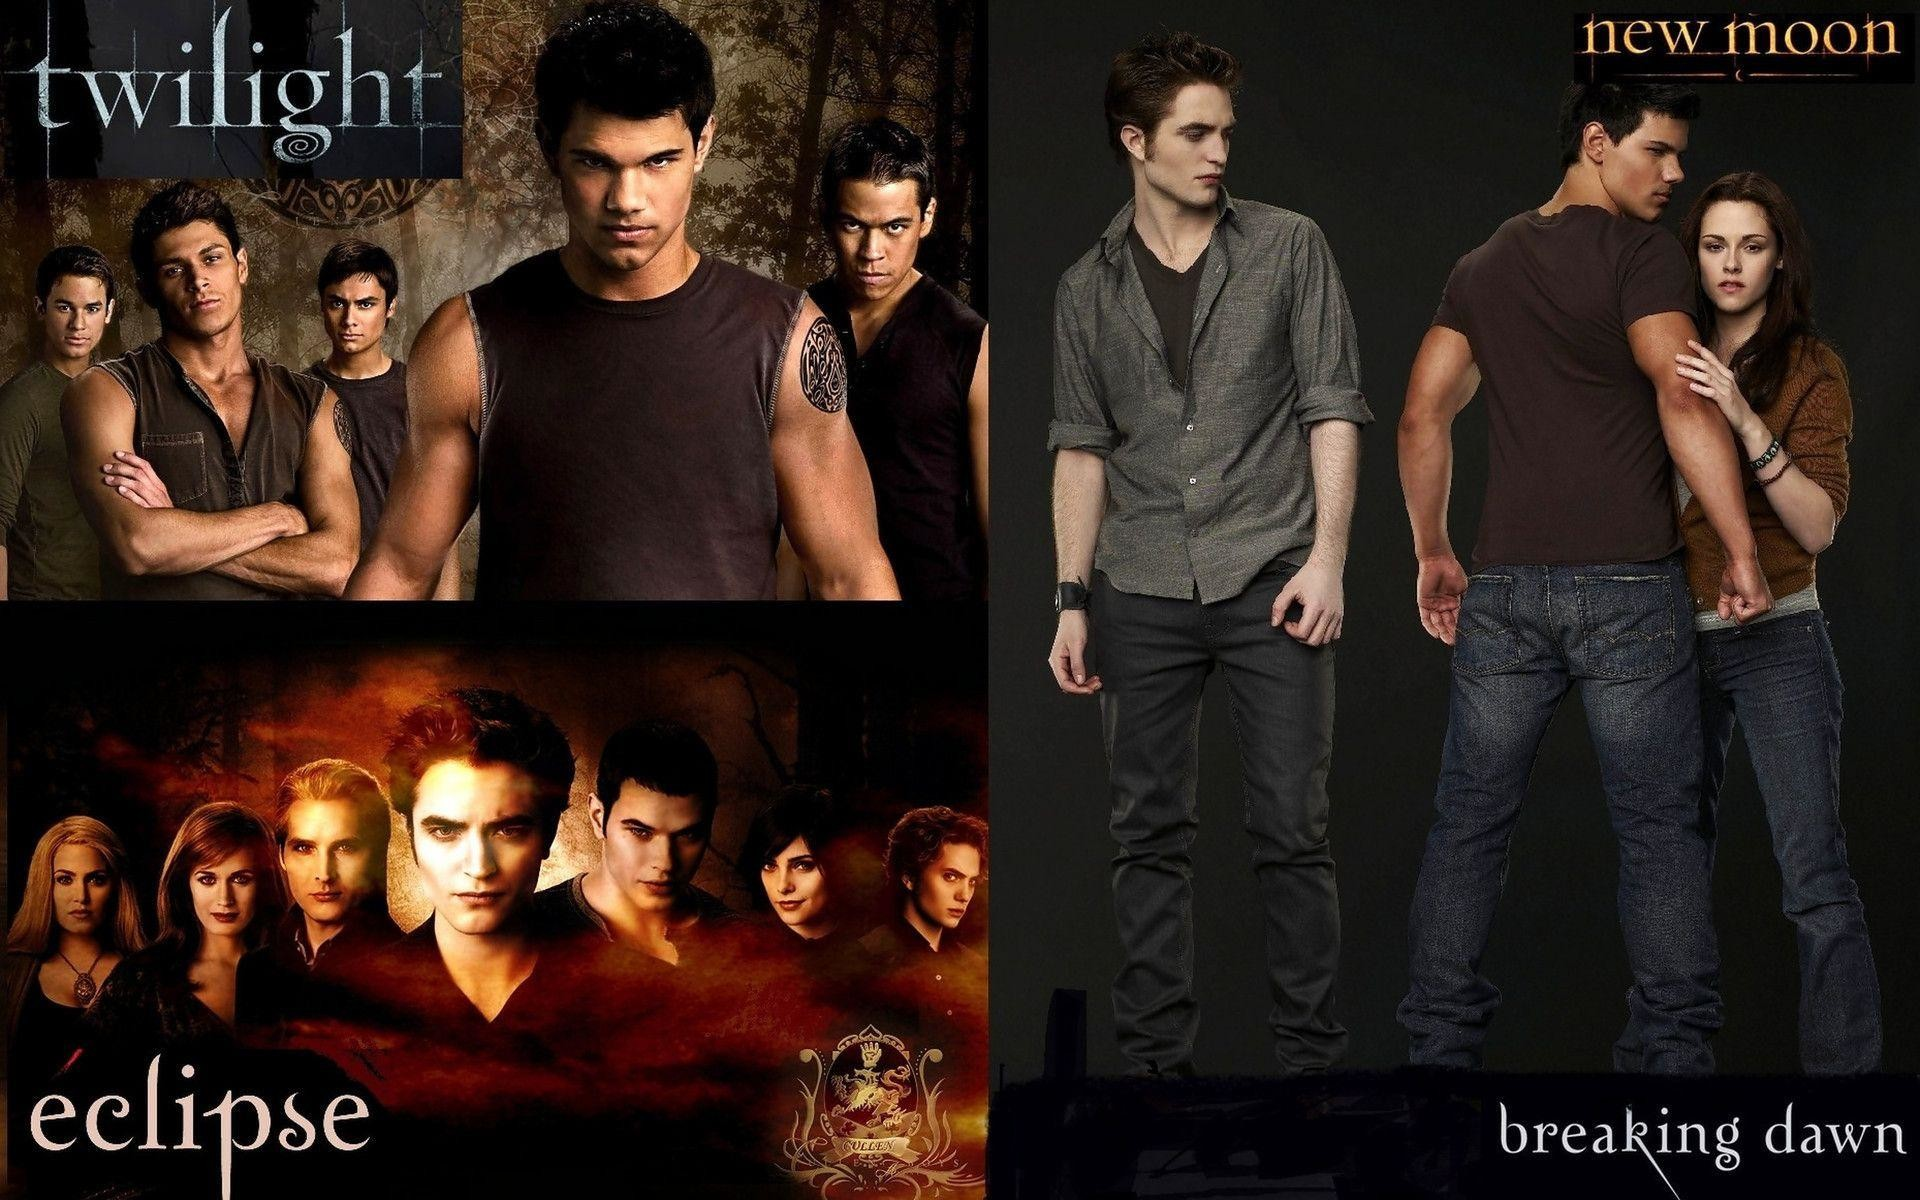 Twilight saga wallpapers - Twilight wallpaper ...